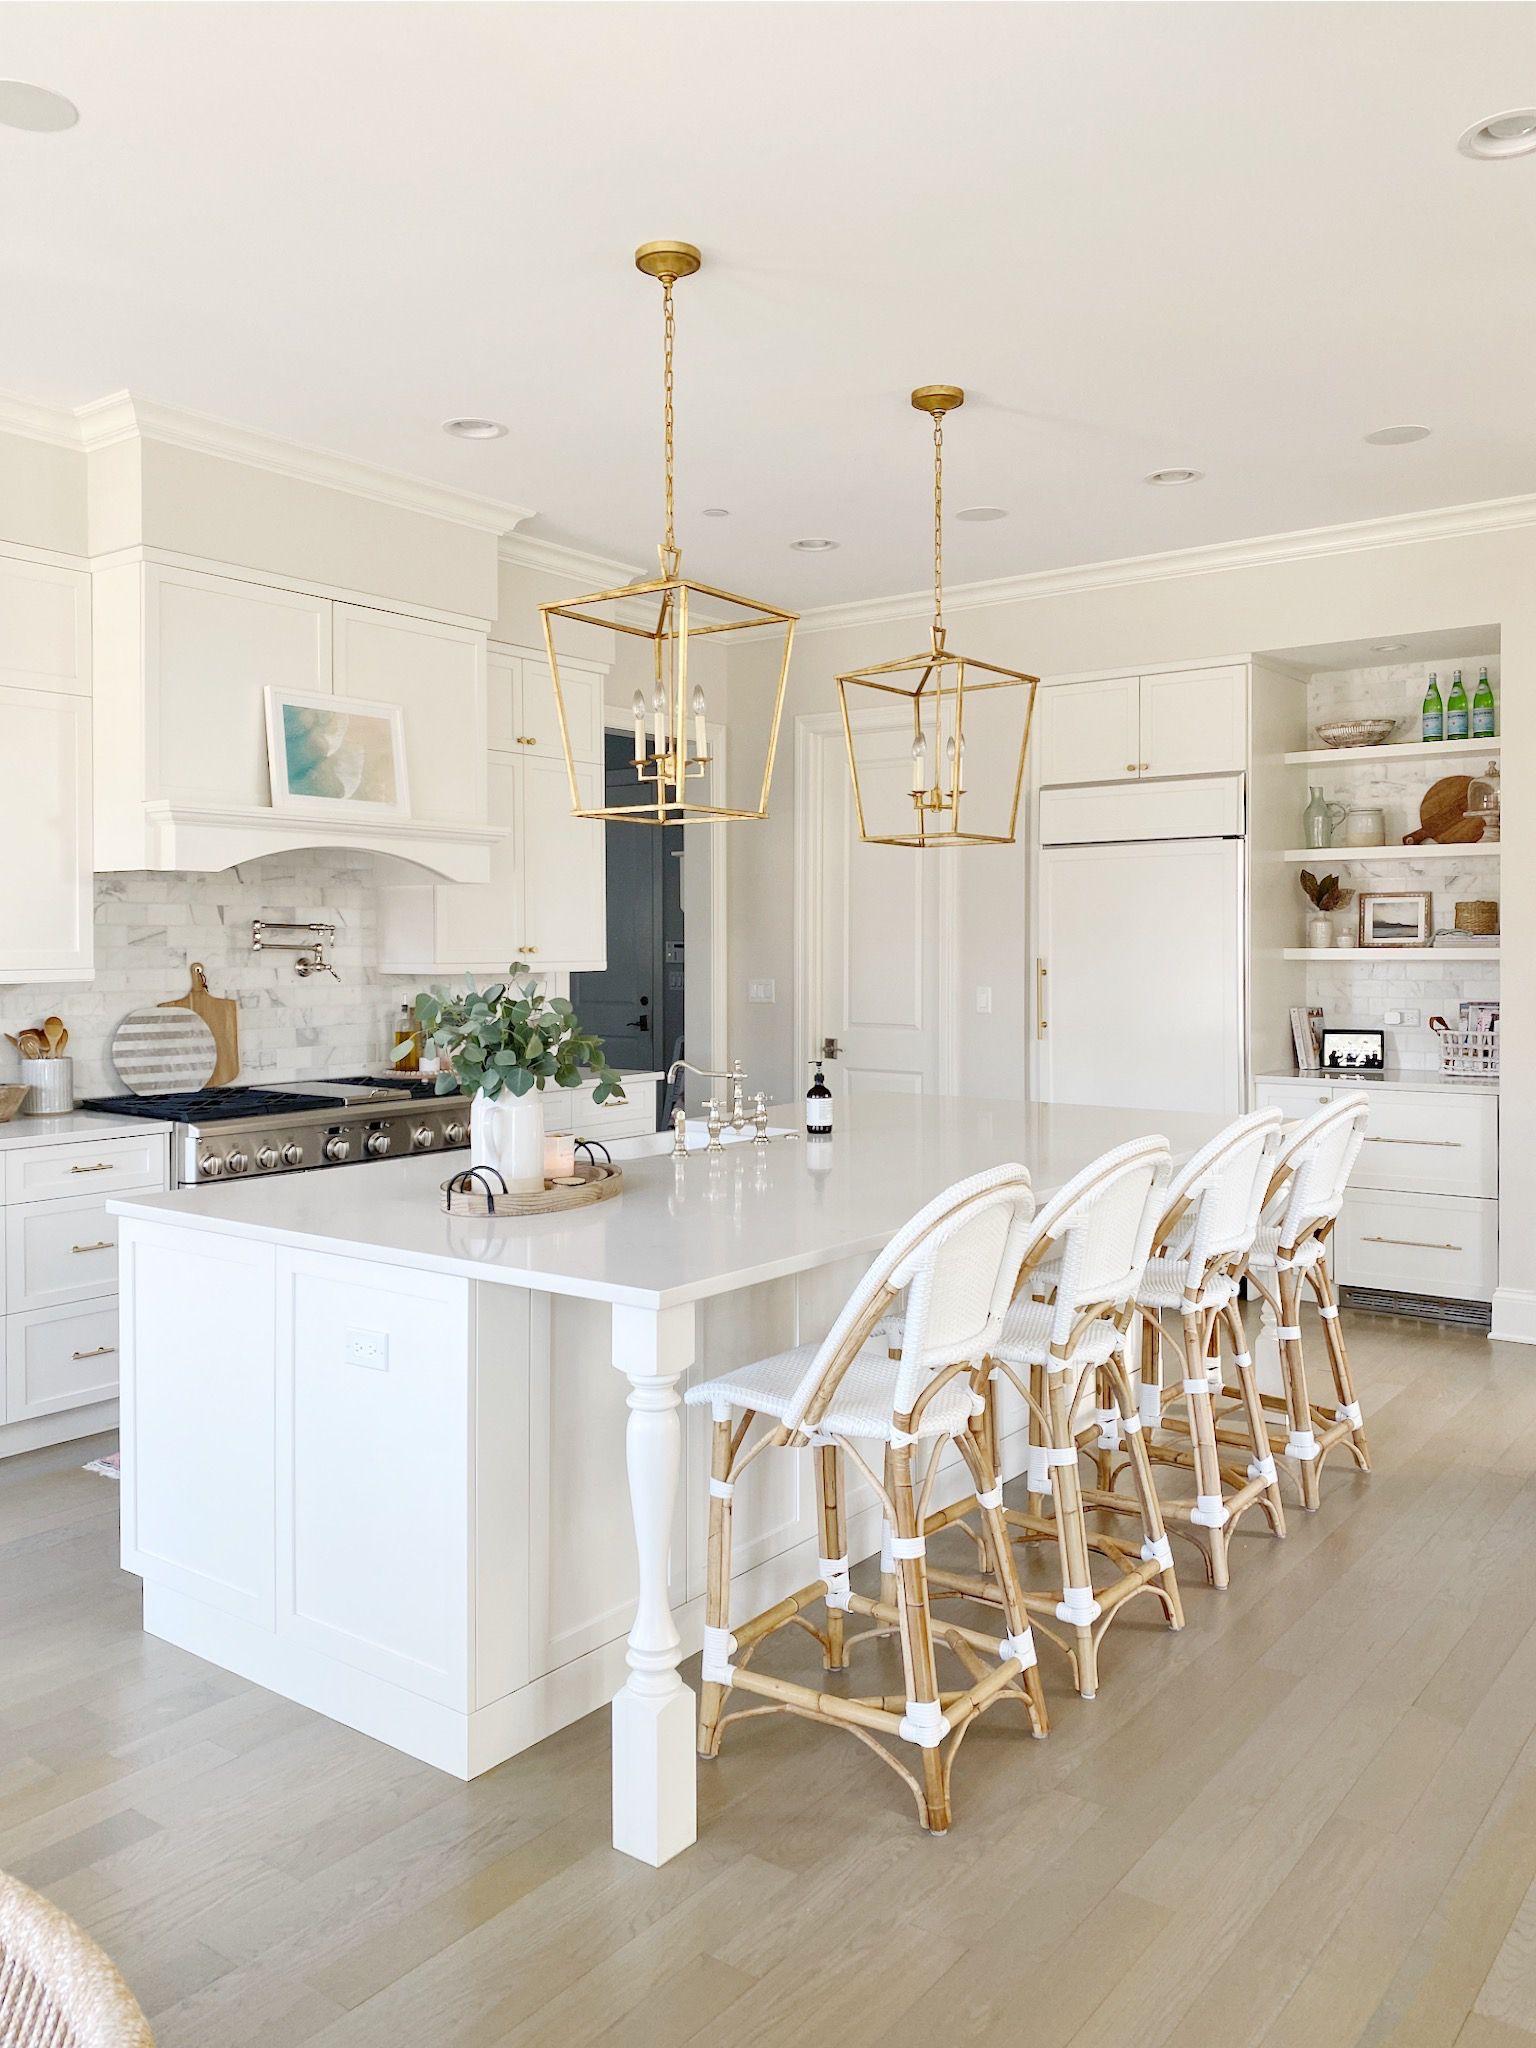 5 Inspiring Kitchens To Copy Now Liketoknowit In 2020 Kitchen Inspirations Stylish Kitchen Dream Kitchen